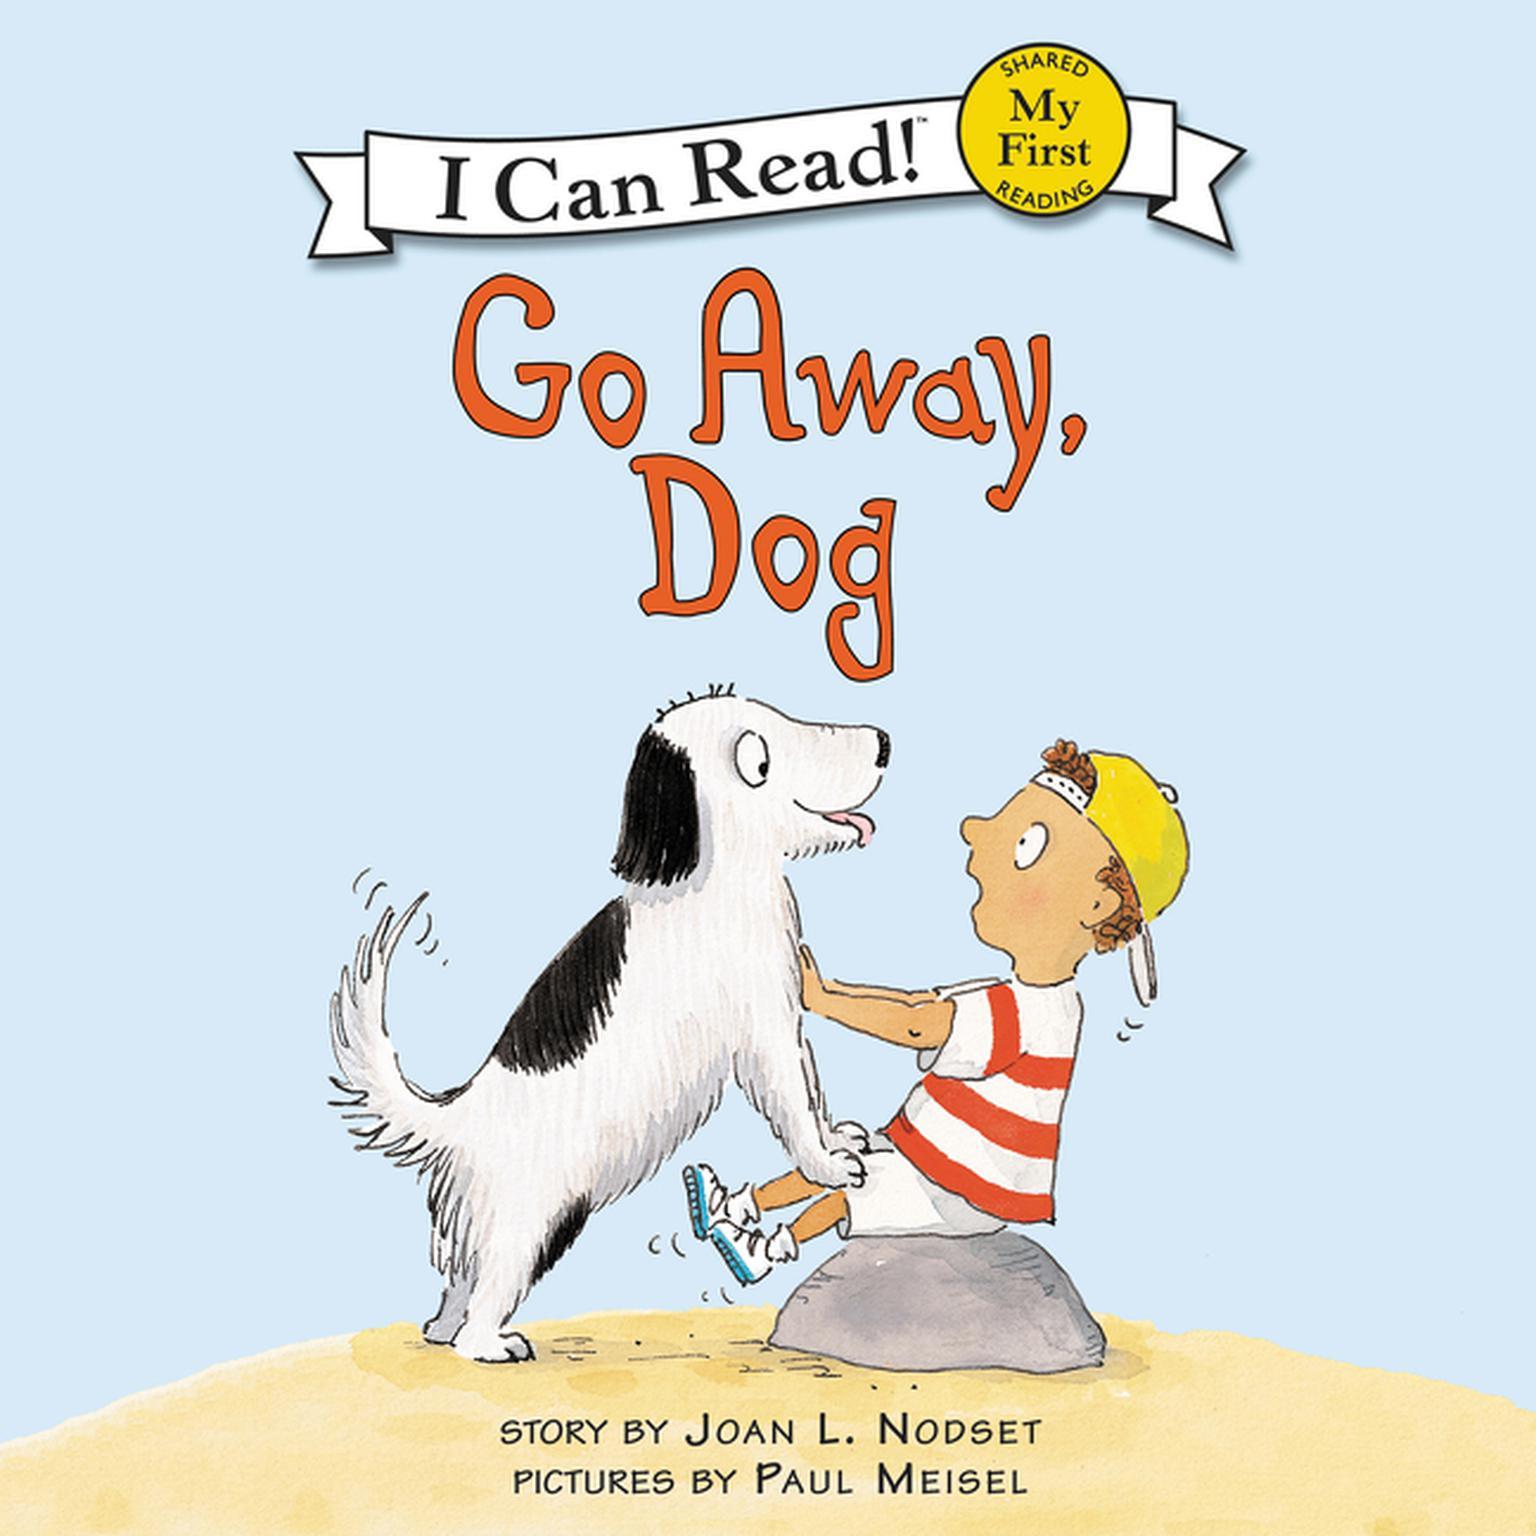 Download Go Away Dog Audiobook By Joan L Nodset For Just